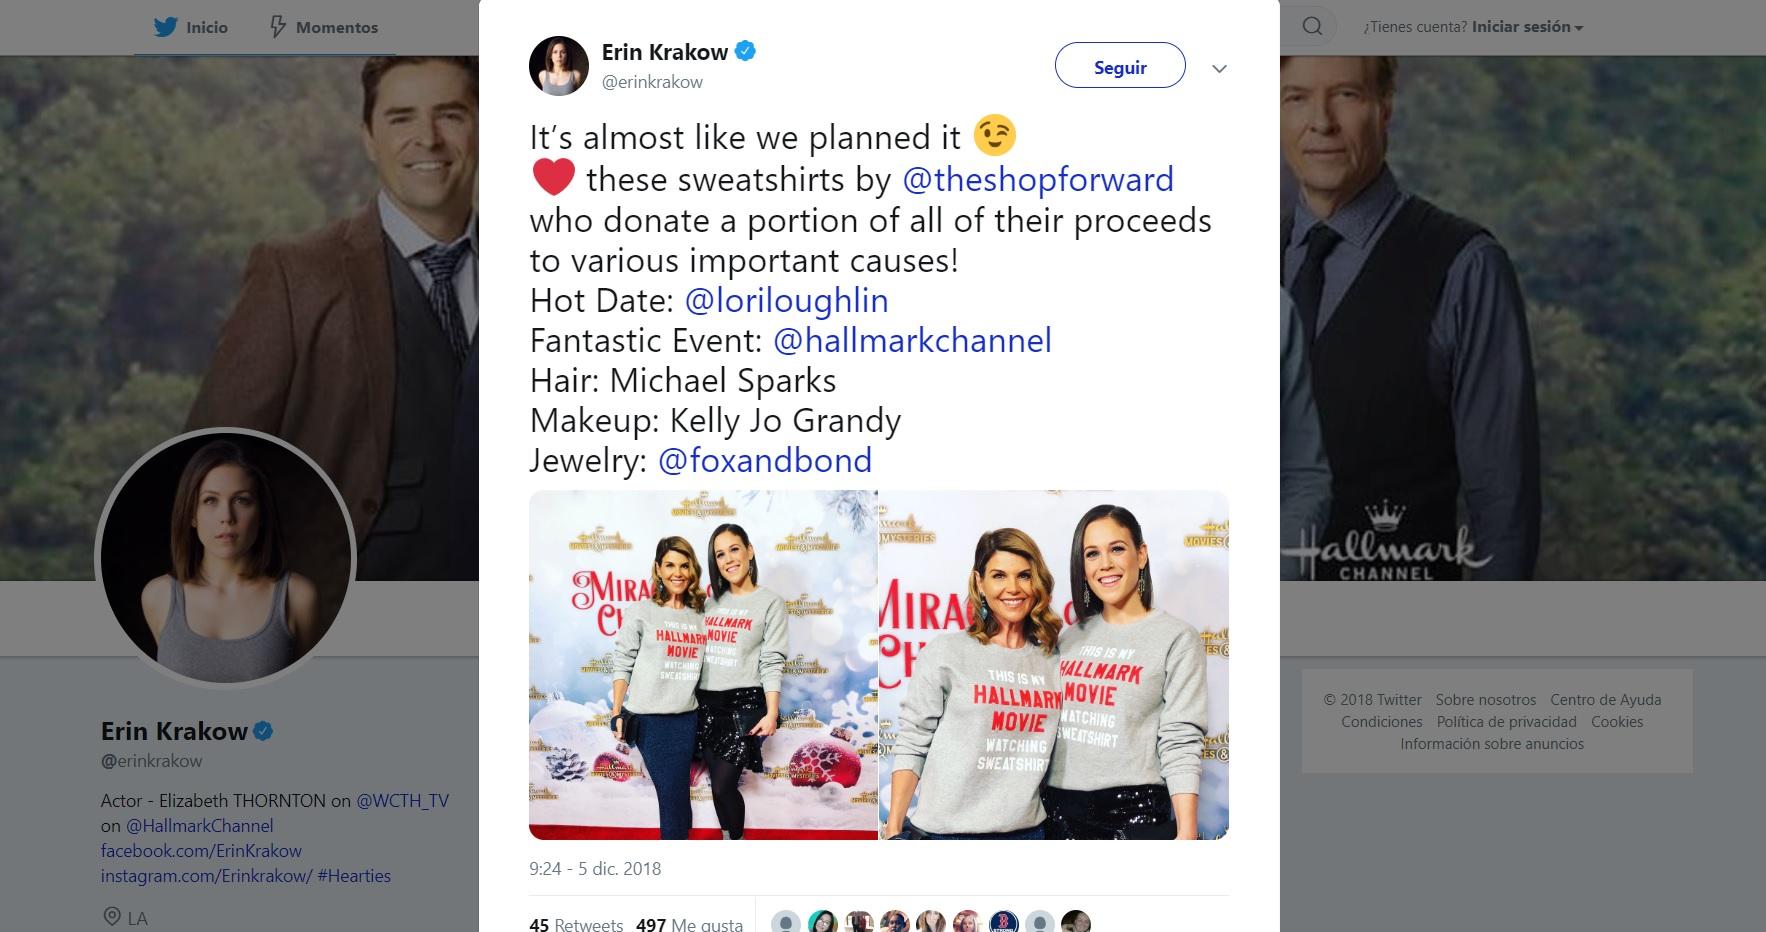 When Calls the Heart pals Erin Krakow, Lori Loughlin share a sweatshirt sister